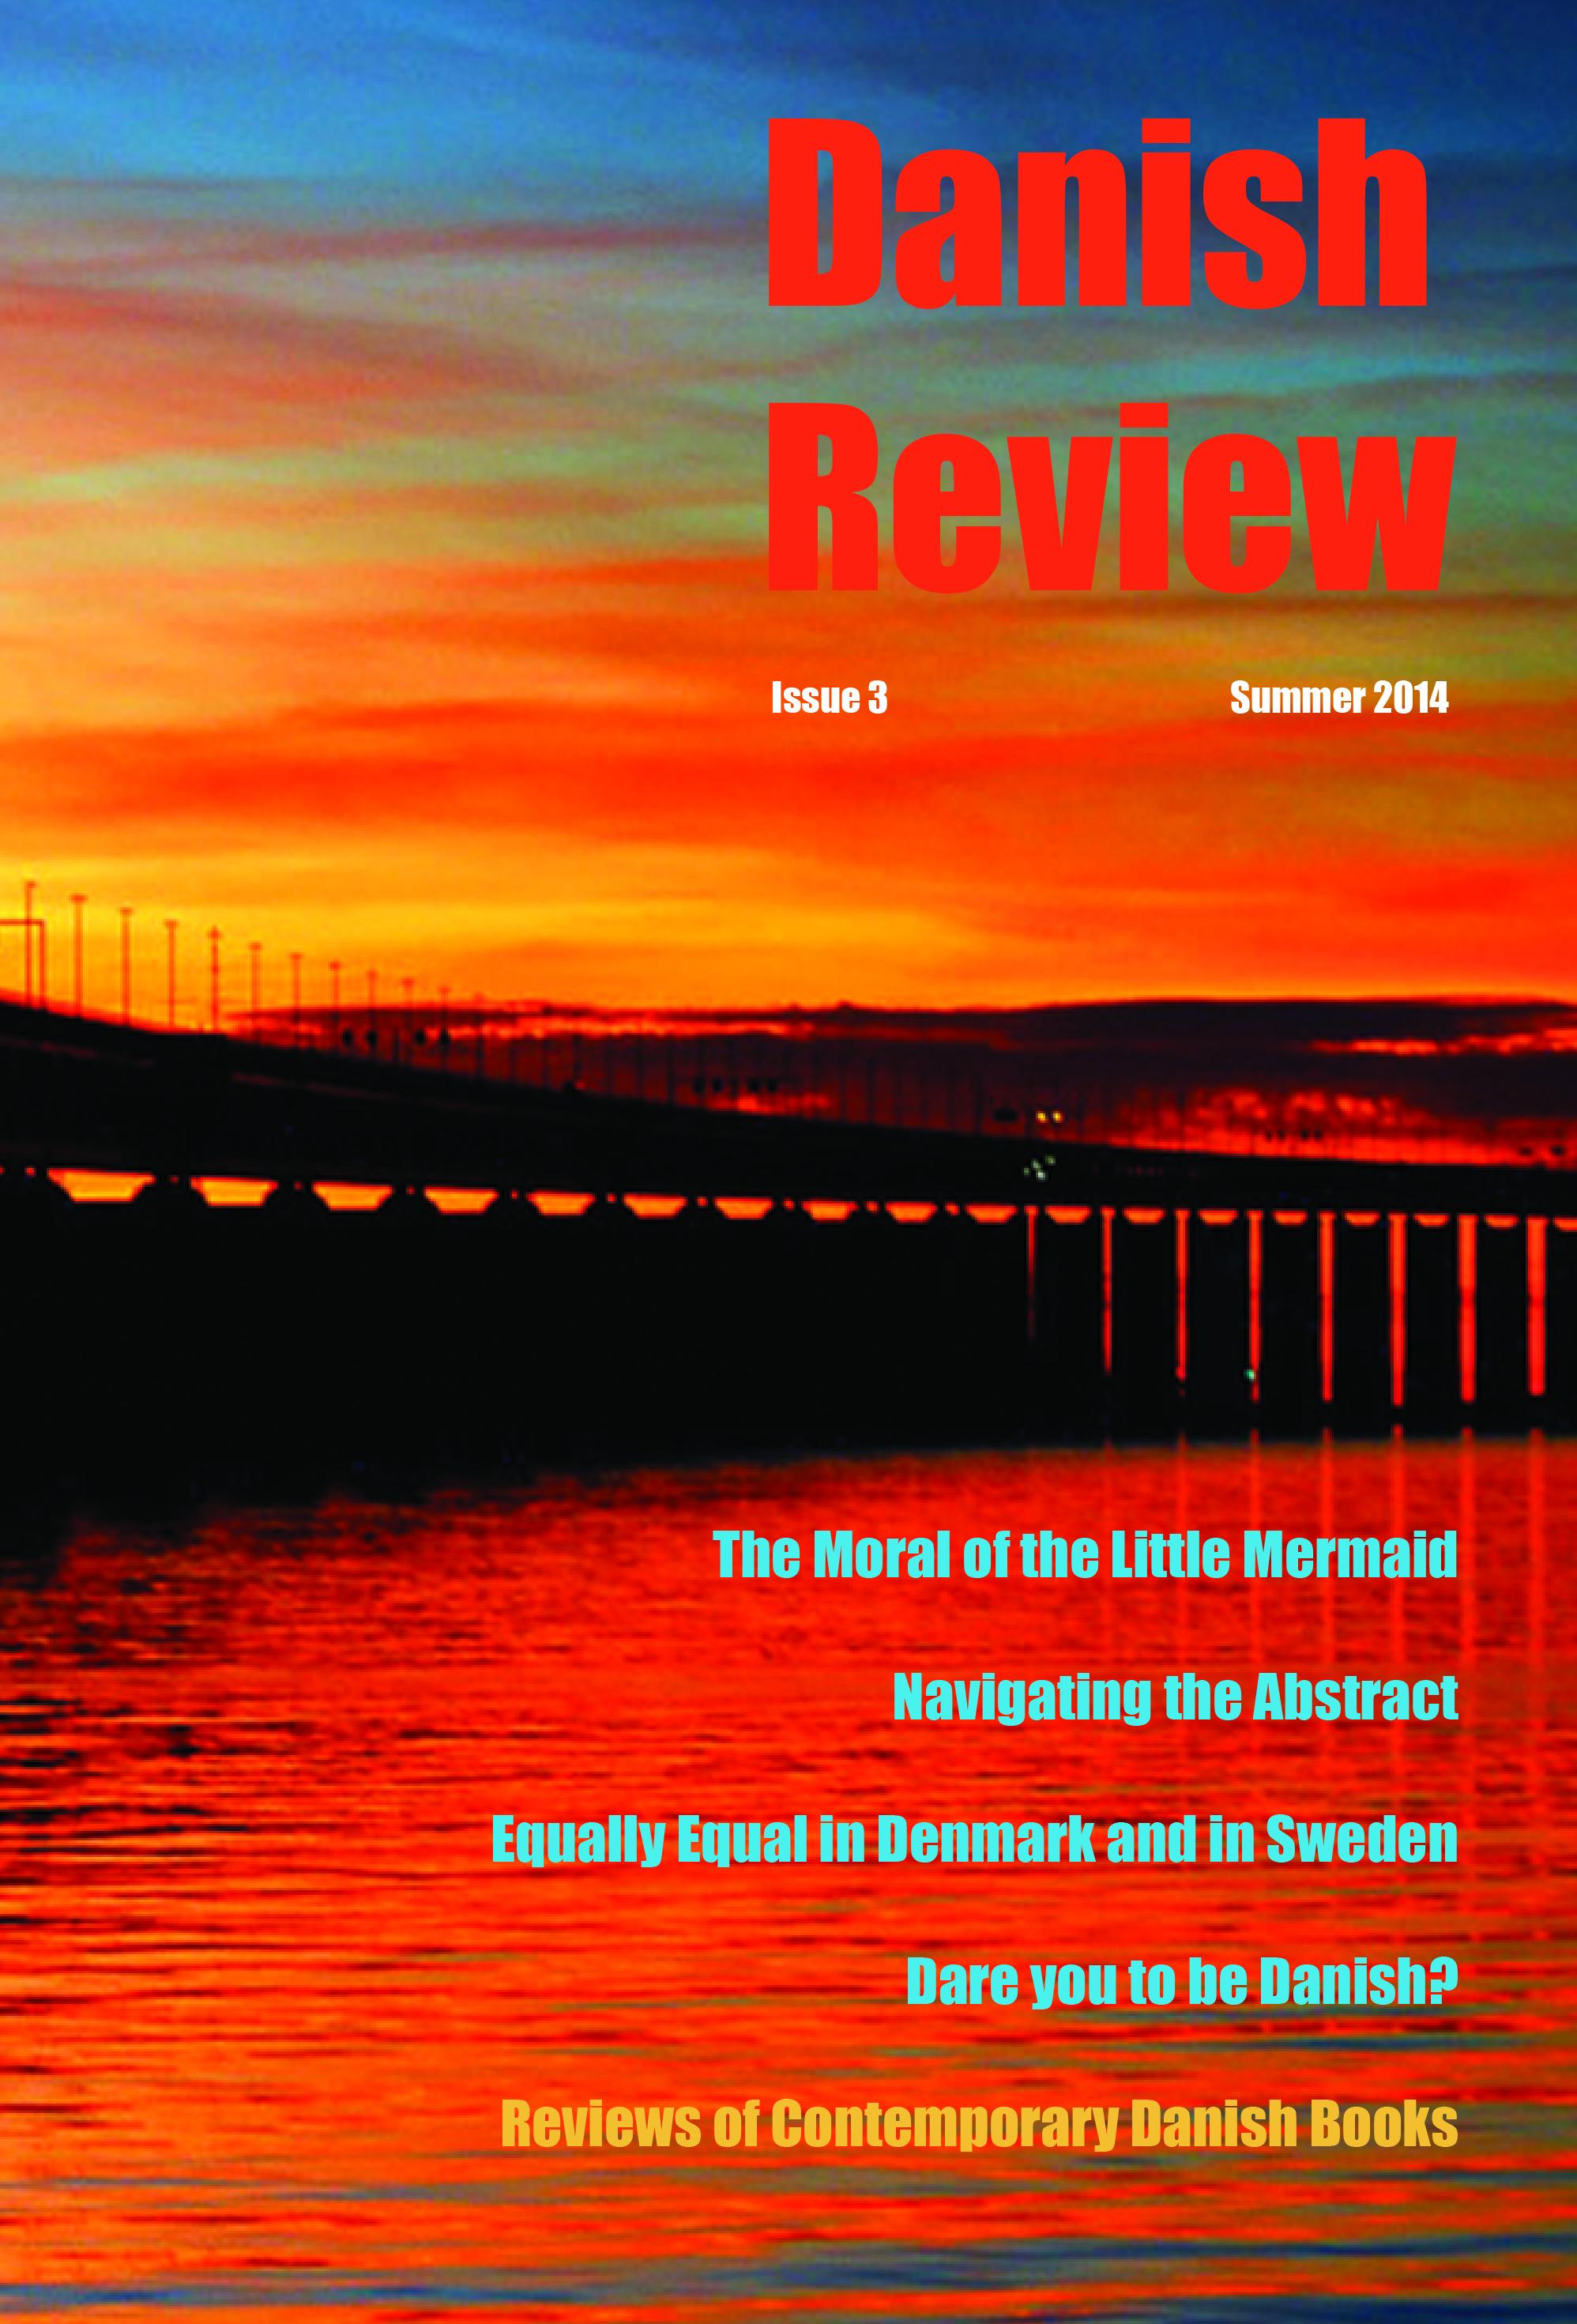 Danish Review Cover 2014 Thumbnail